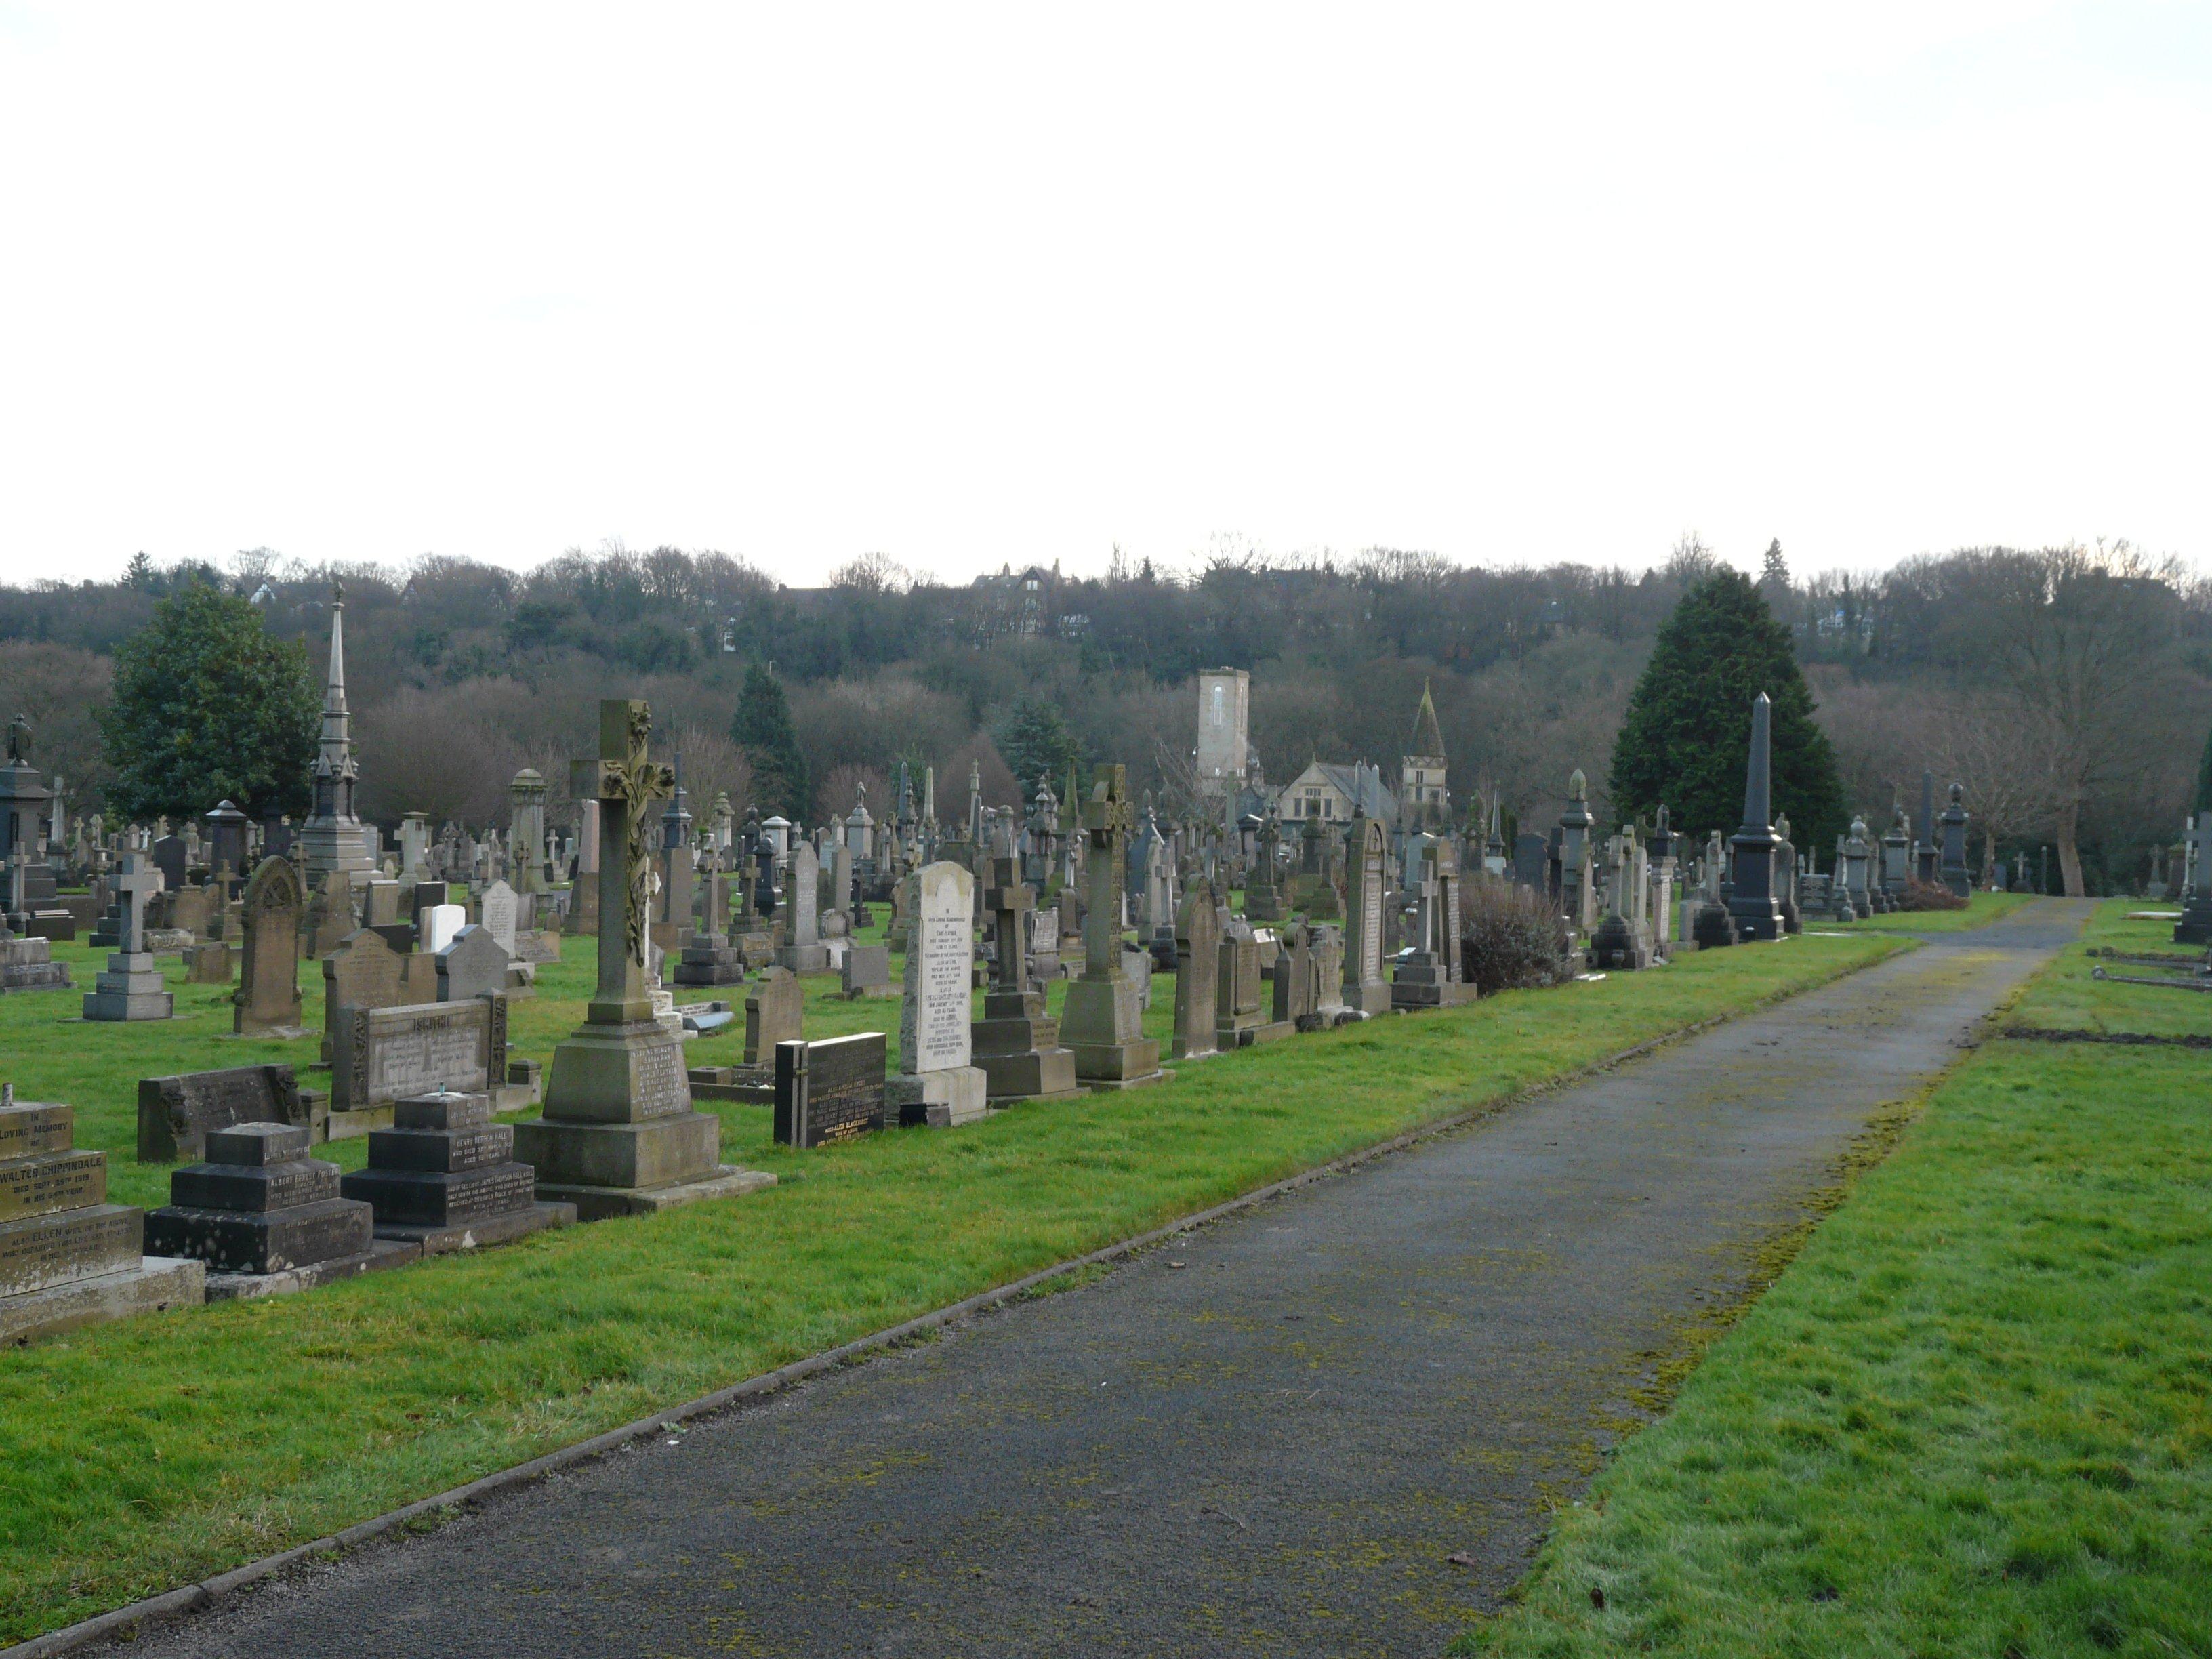 Nab Wood Cemetery and Crematorium